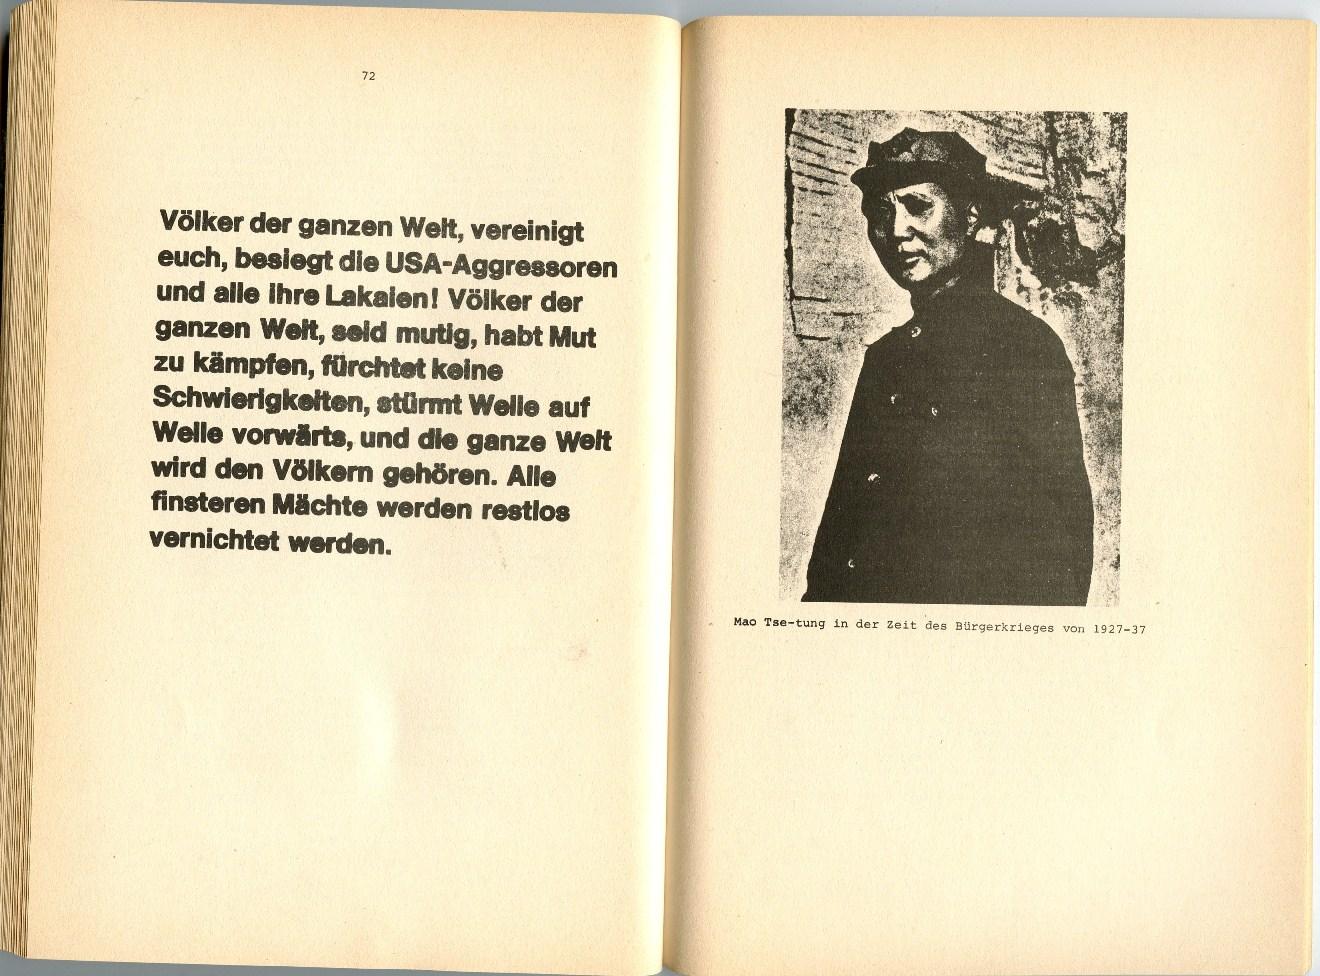 ZB_VRChina_Bollwerk_1971_38